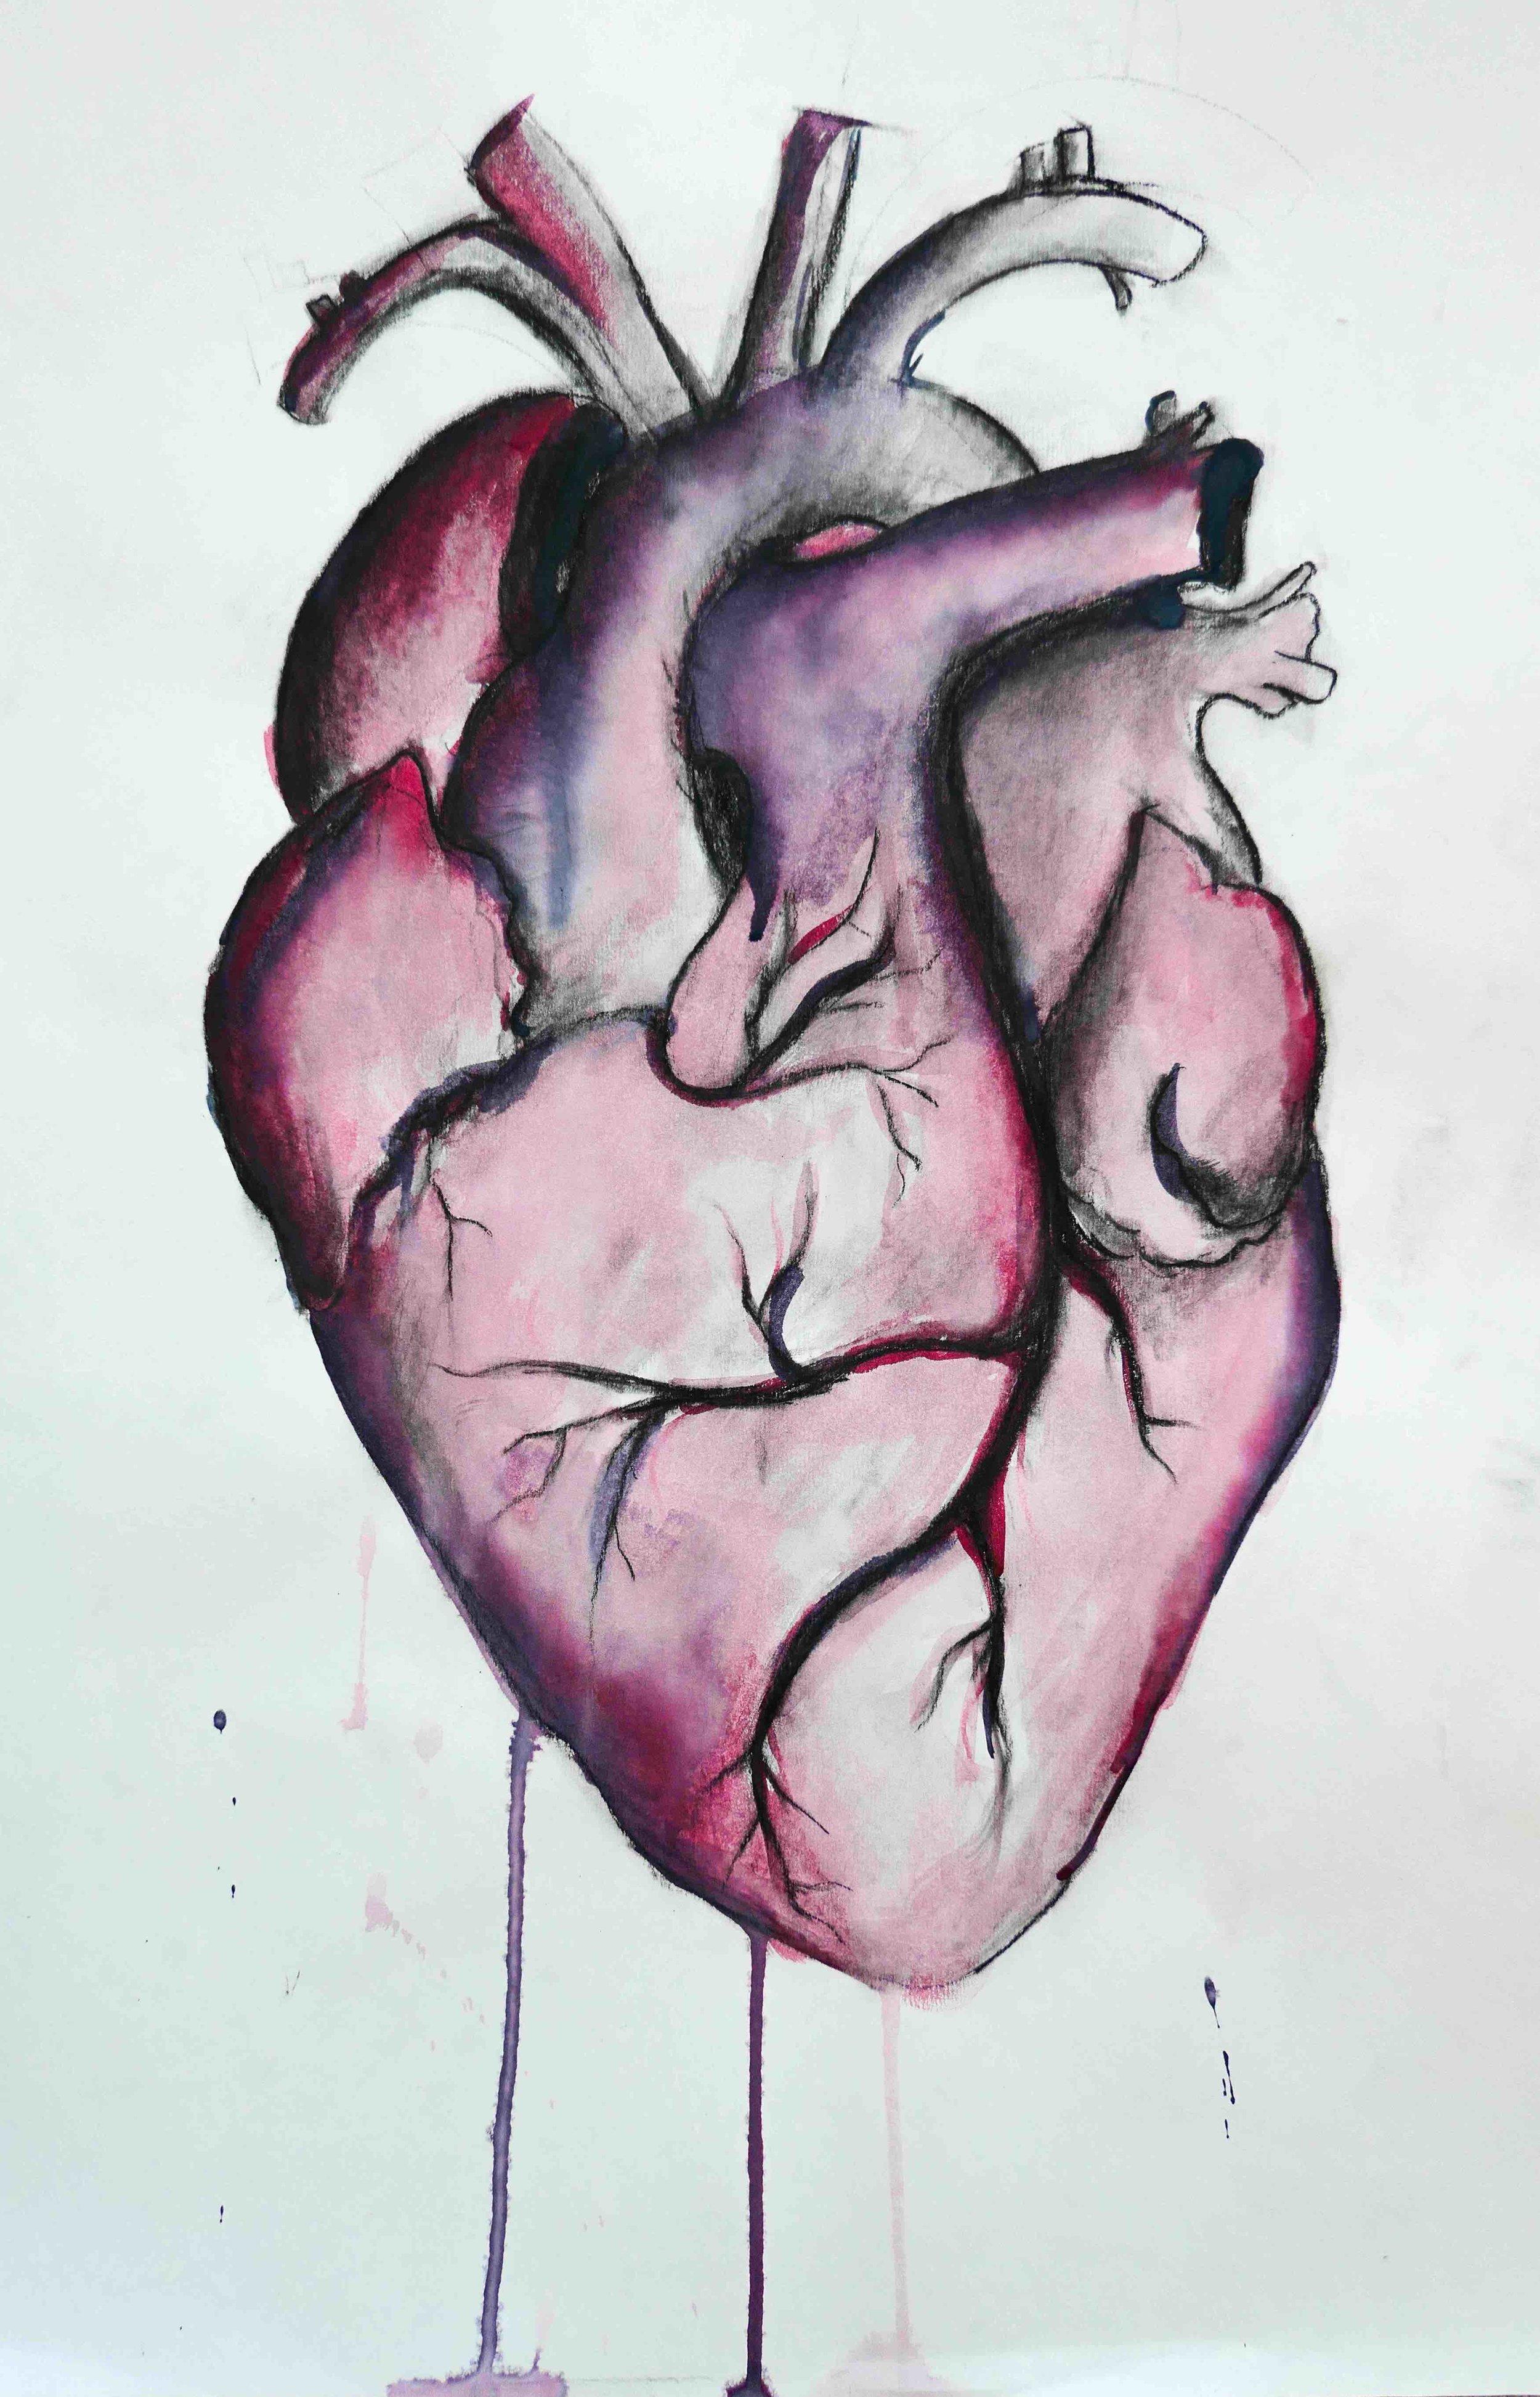 ANATOMICAL HEART by Heather Grace Hancock